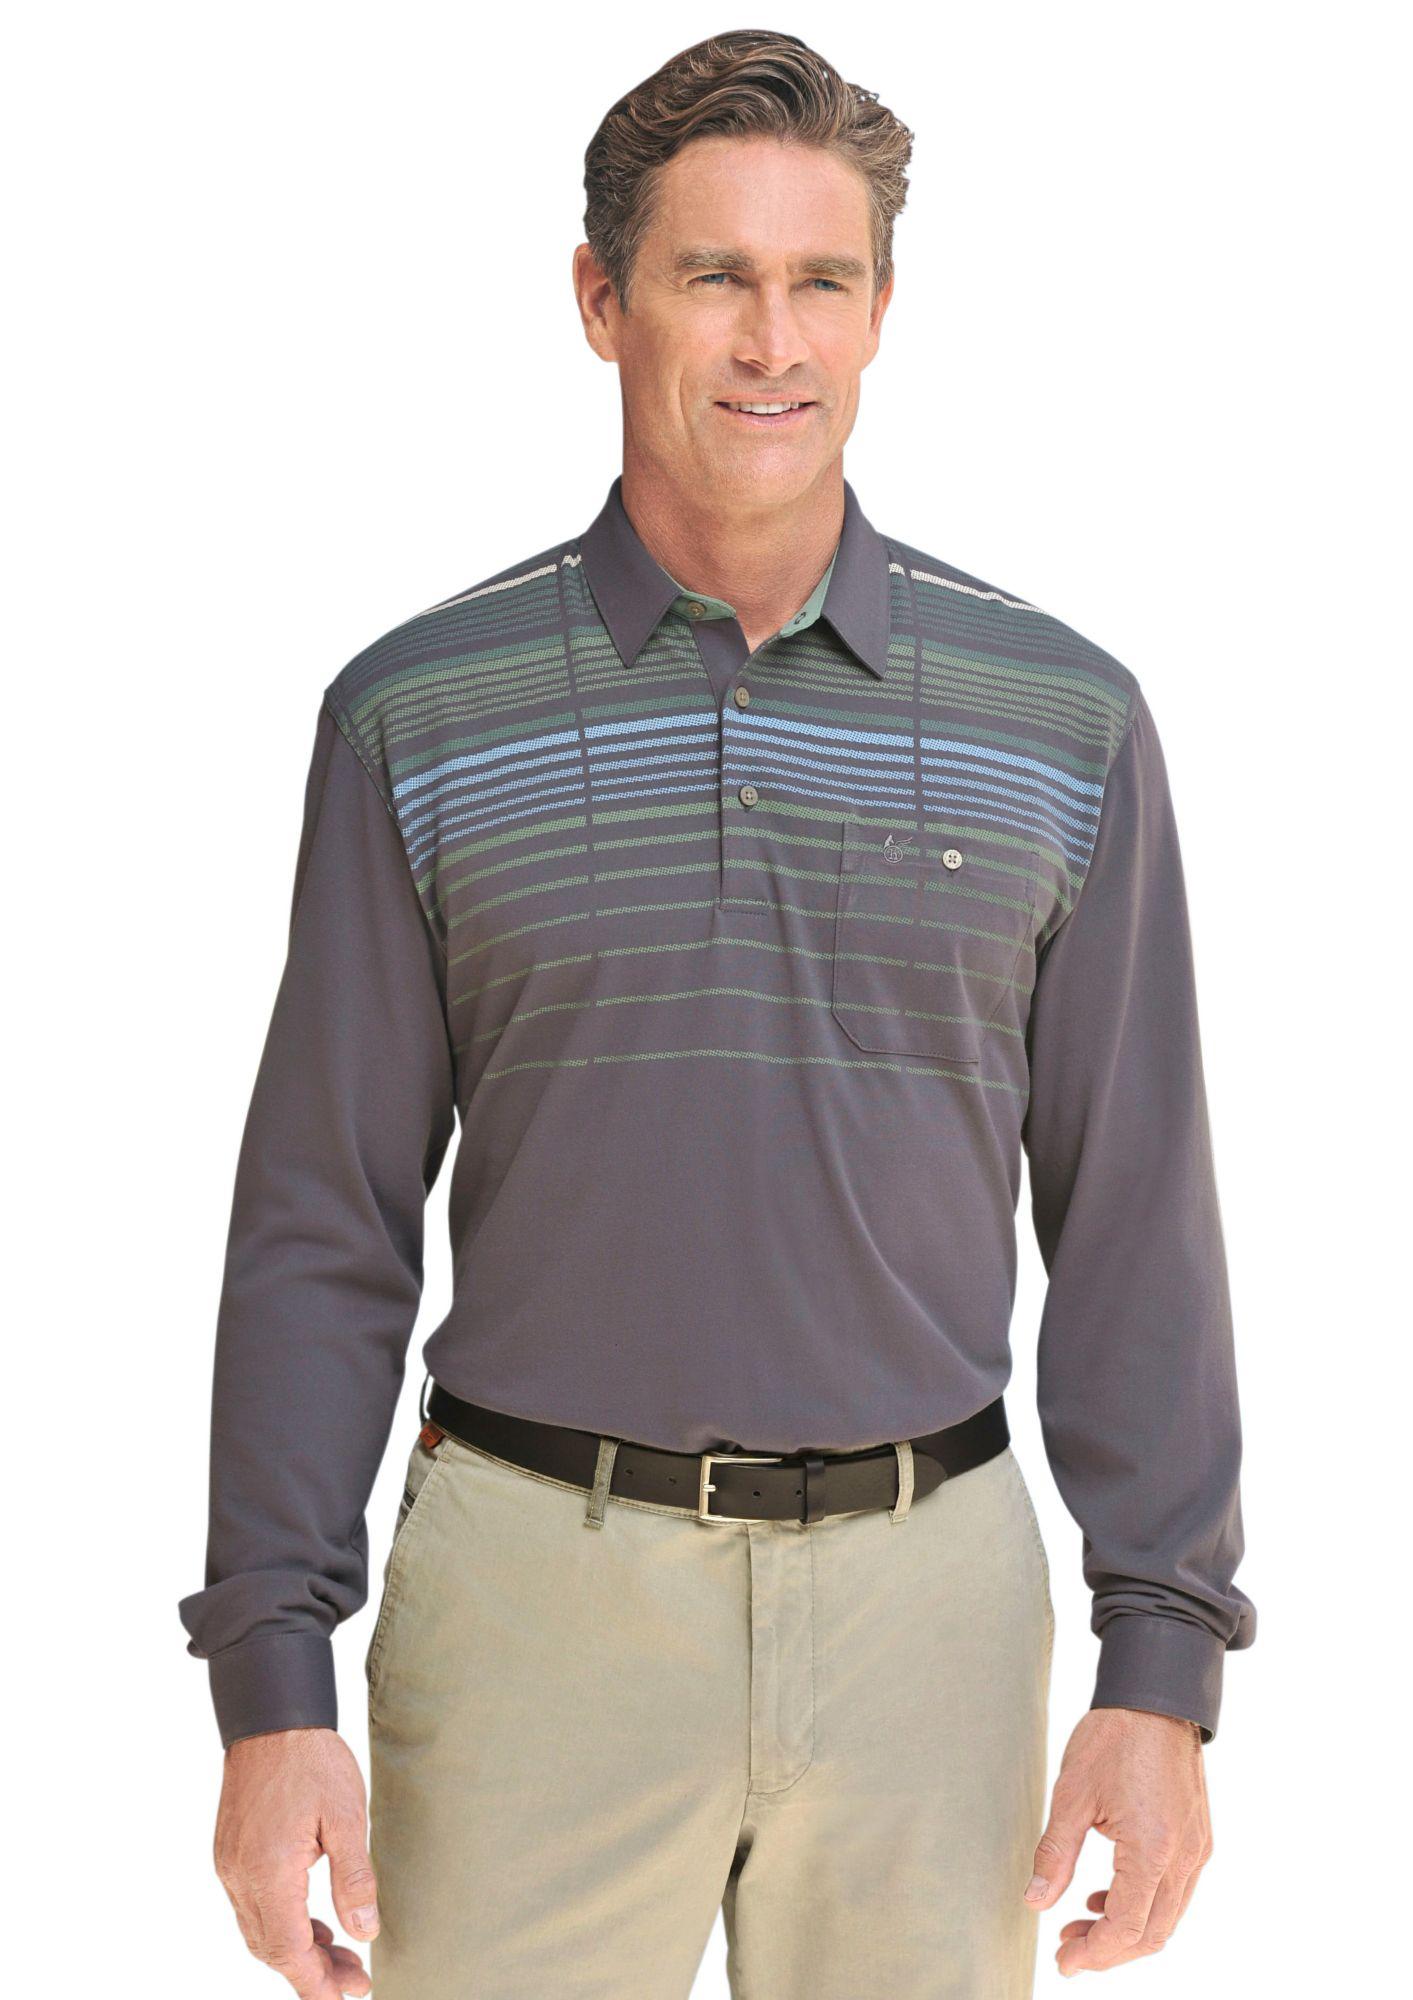 HAJO Hajo Langarm-Poloshirt in bewährter »stay fresh«-Qualität